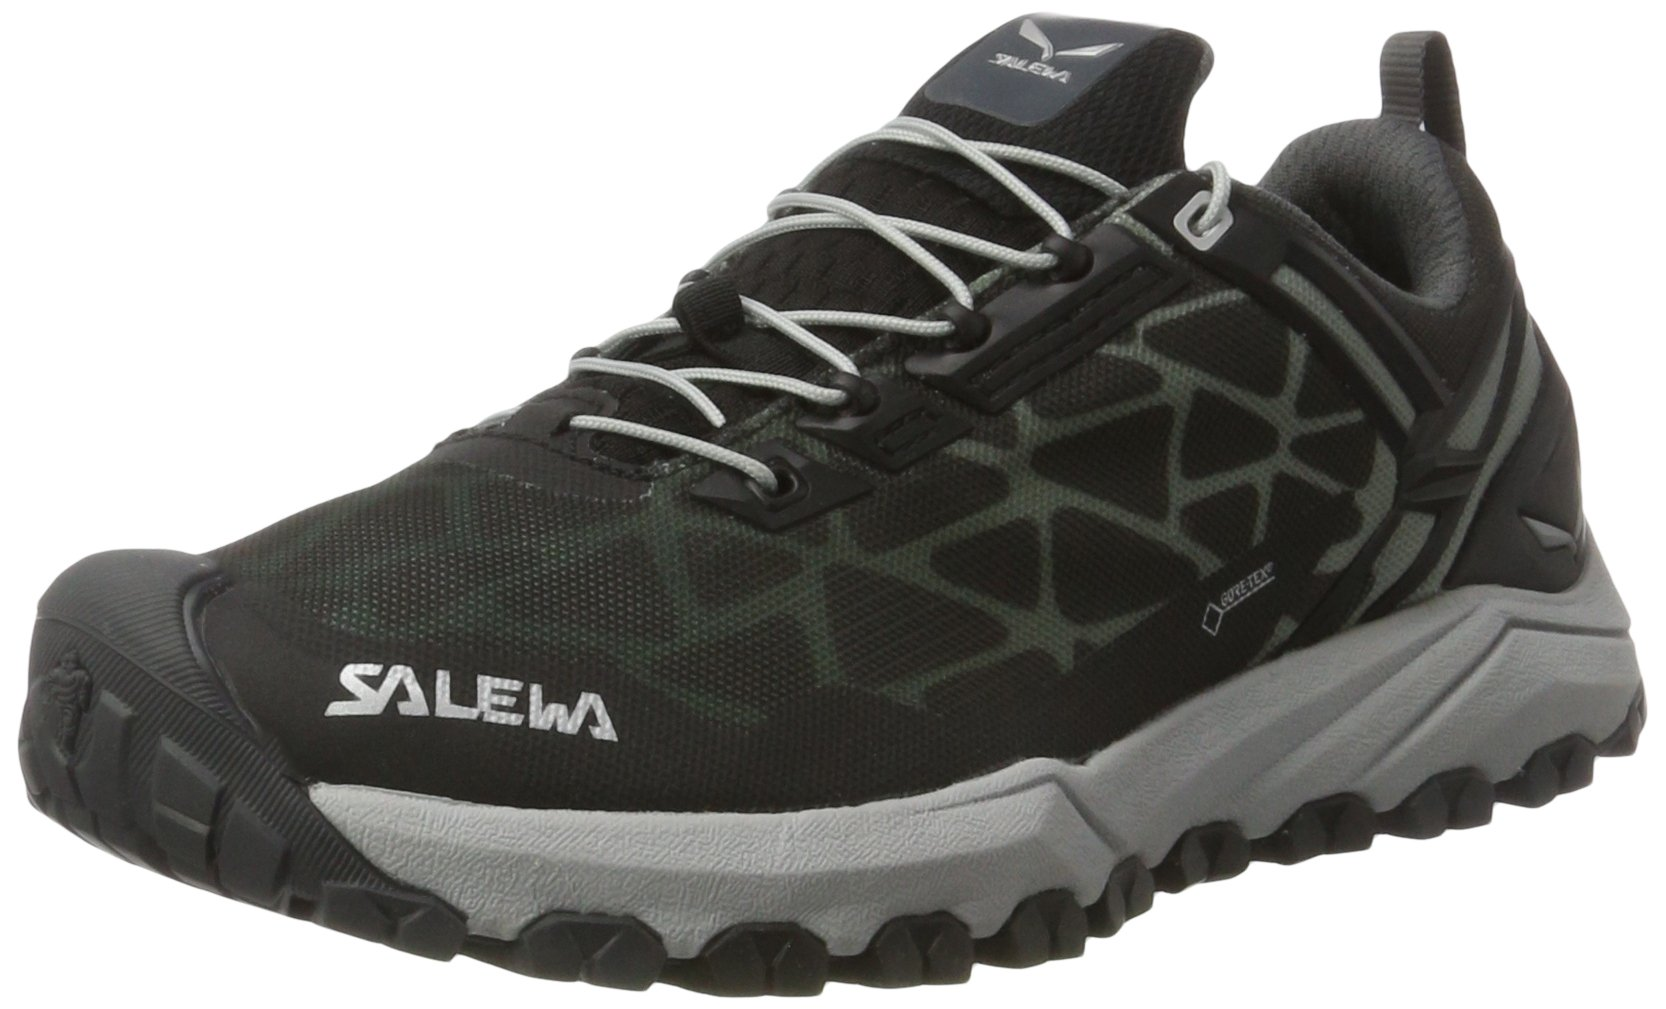 Salewa Women's Multi Track GTX Speed Hiking Shoe, Black/Silver, 8